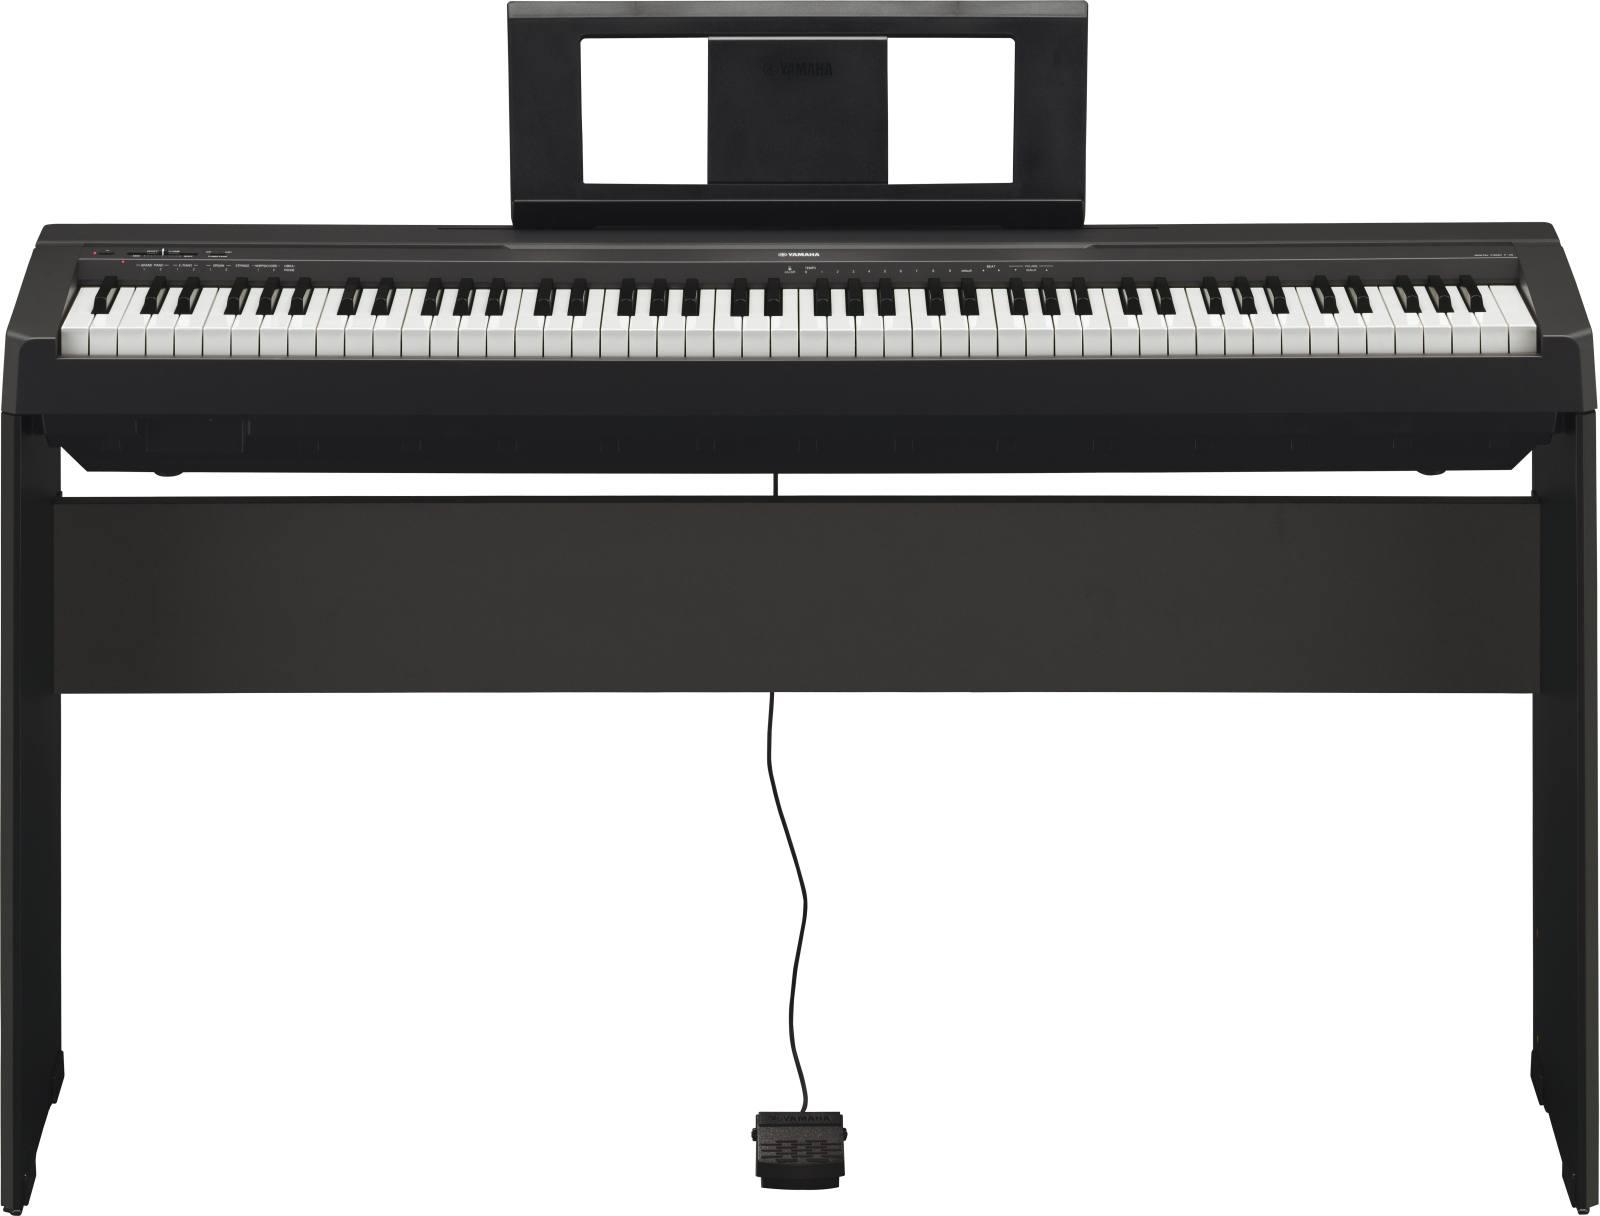 korg digital piano b1 vs yamaha digital piano p45. Black Bedroom Furniture Sets. Home Design Ideas